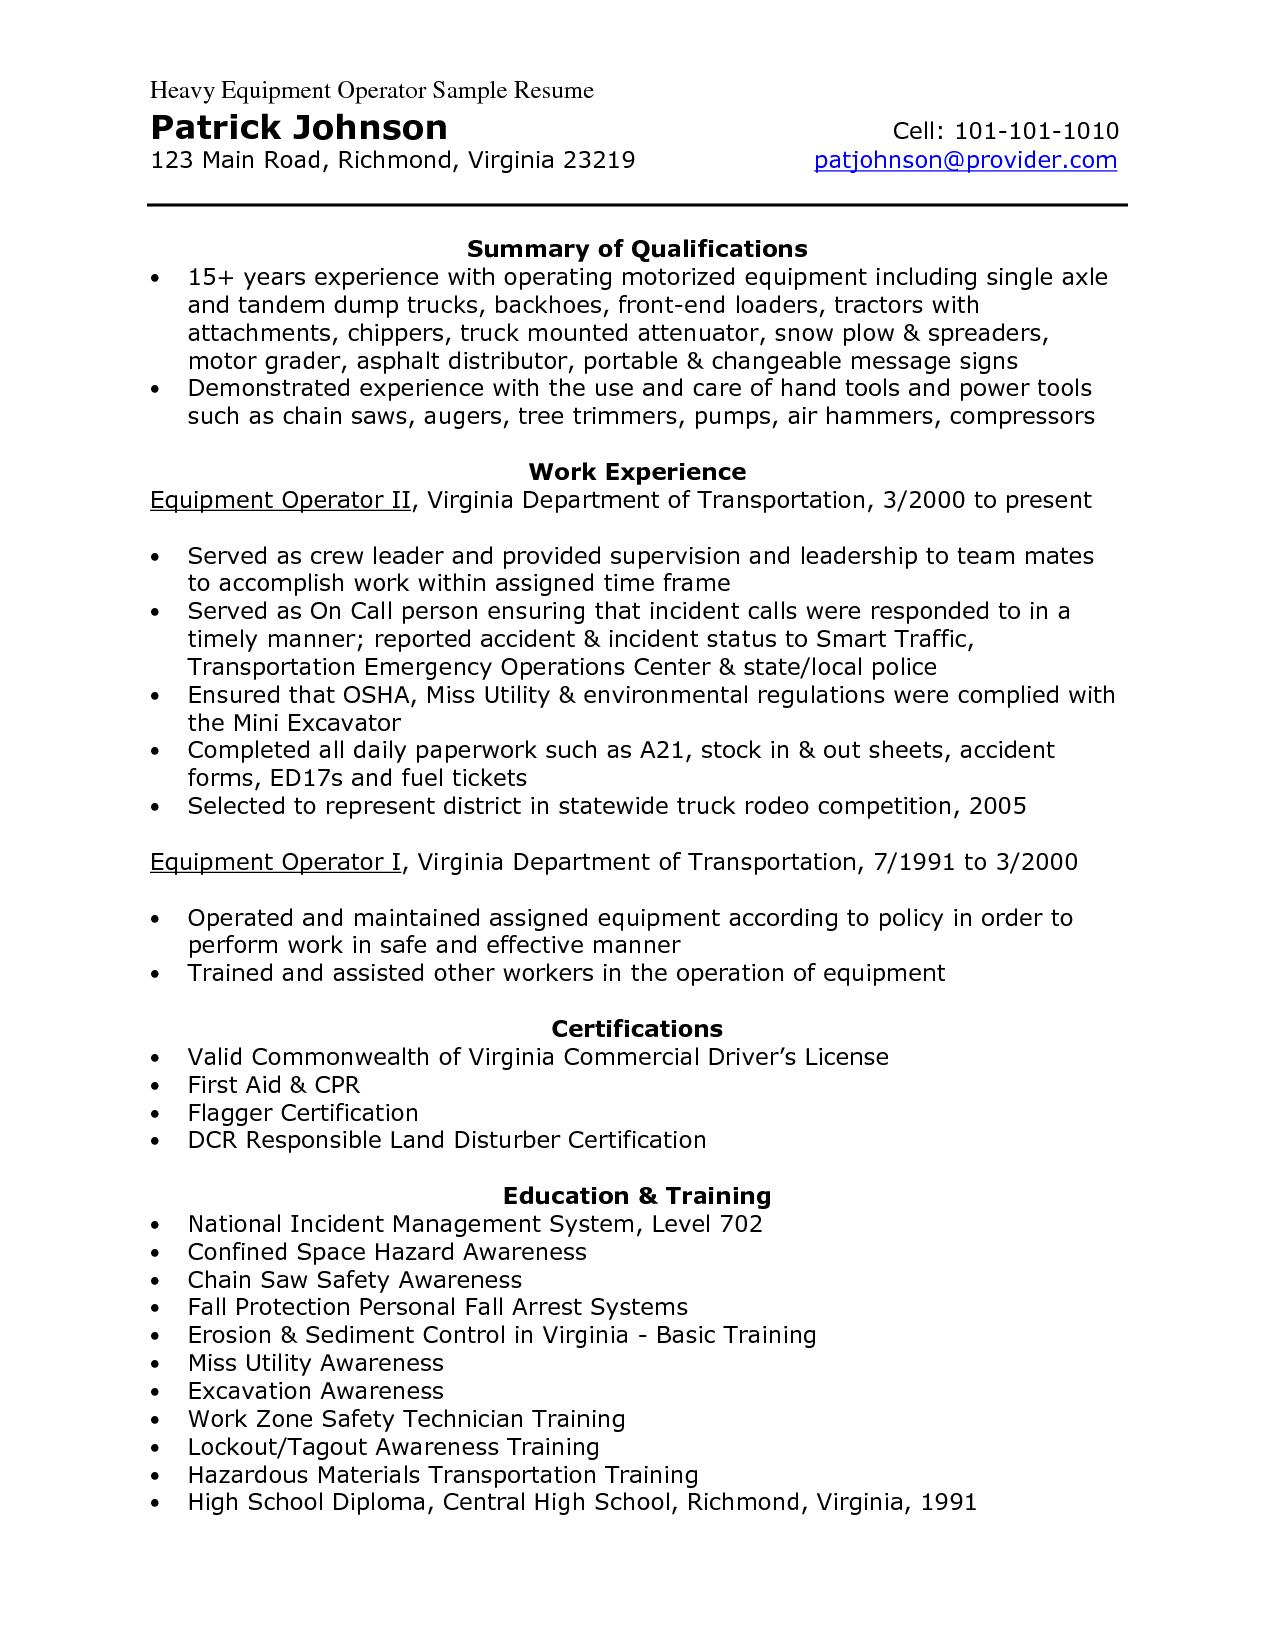 resumes for excavators  Heavy Equipment Operator Sample